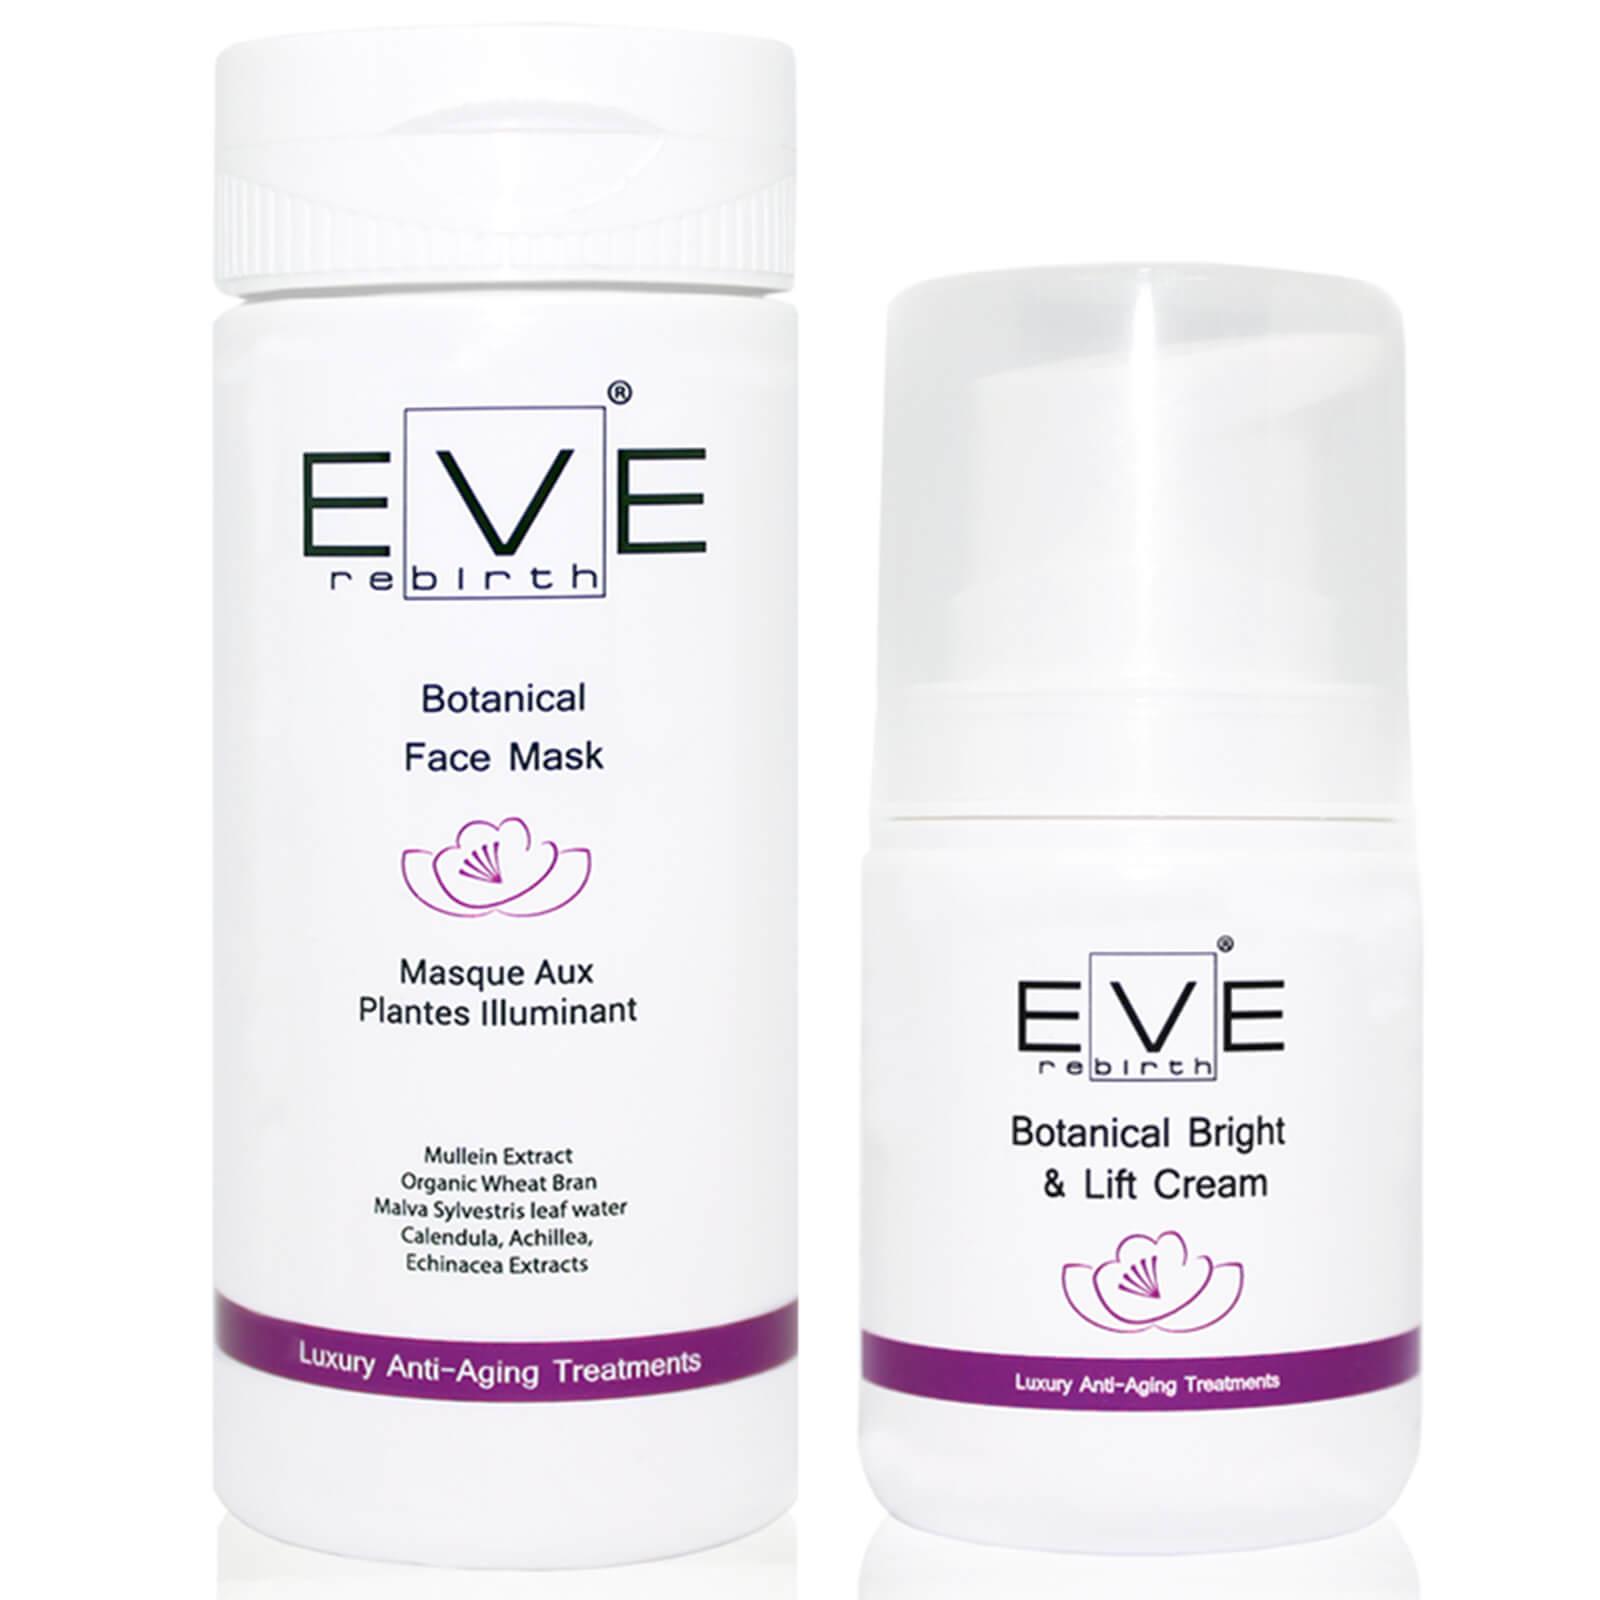 Eve Rebirth Botanical Face Mask Bright Lift Cream Diy Oxygen Sensor Simulator Carolina Hondas Product Description